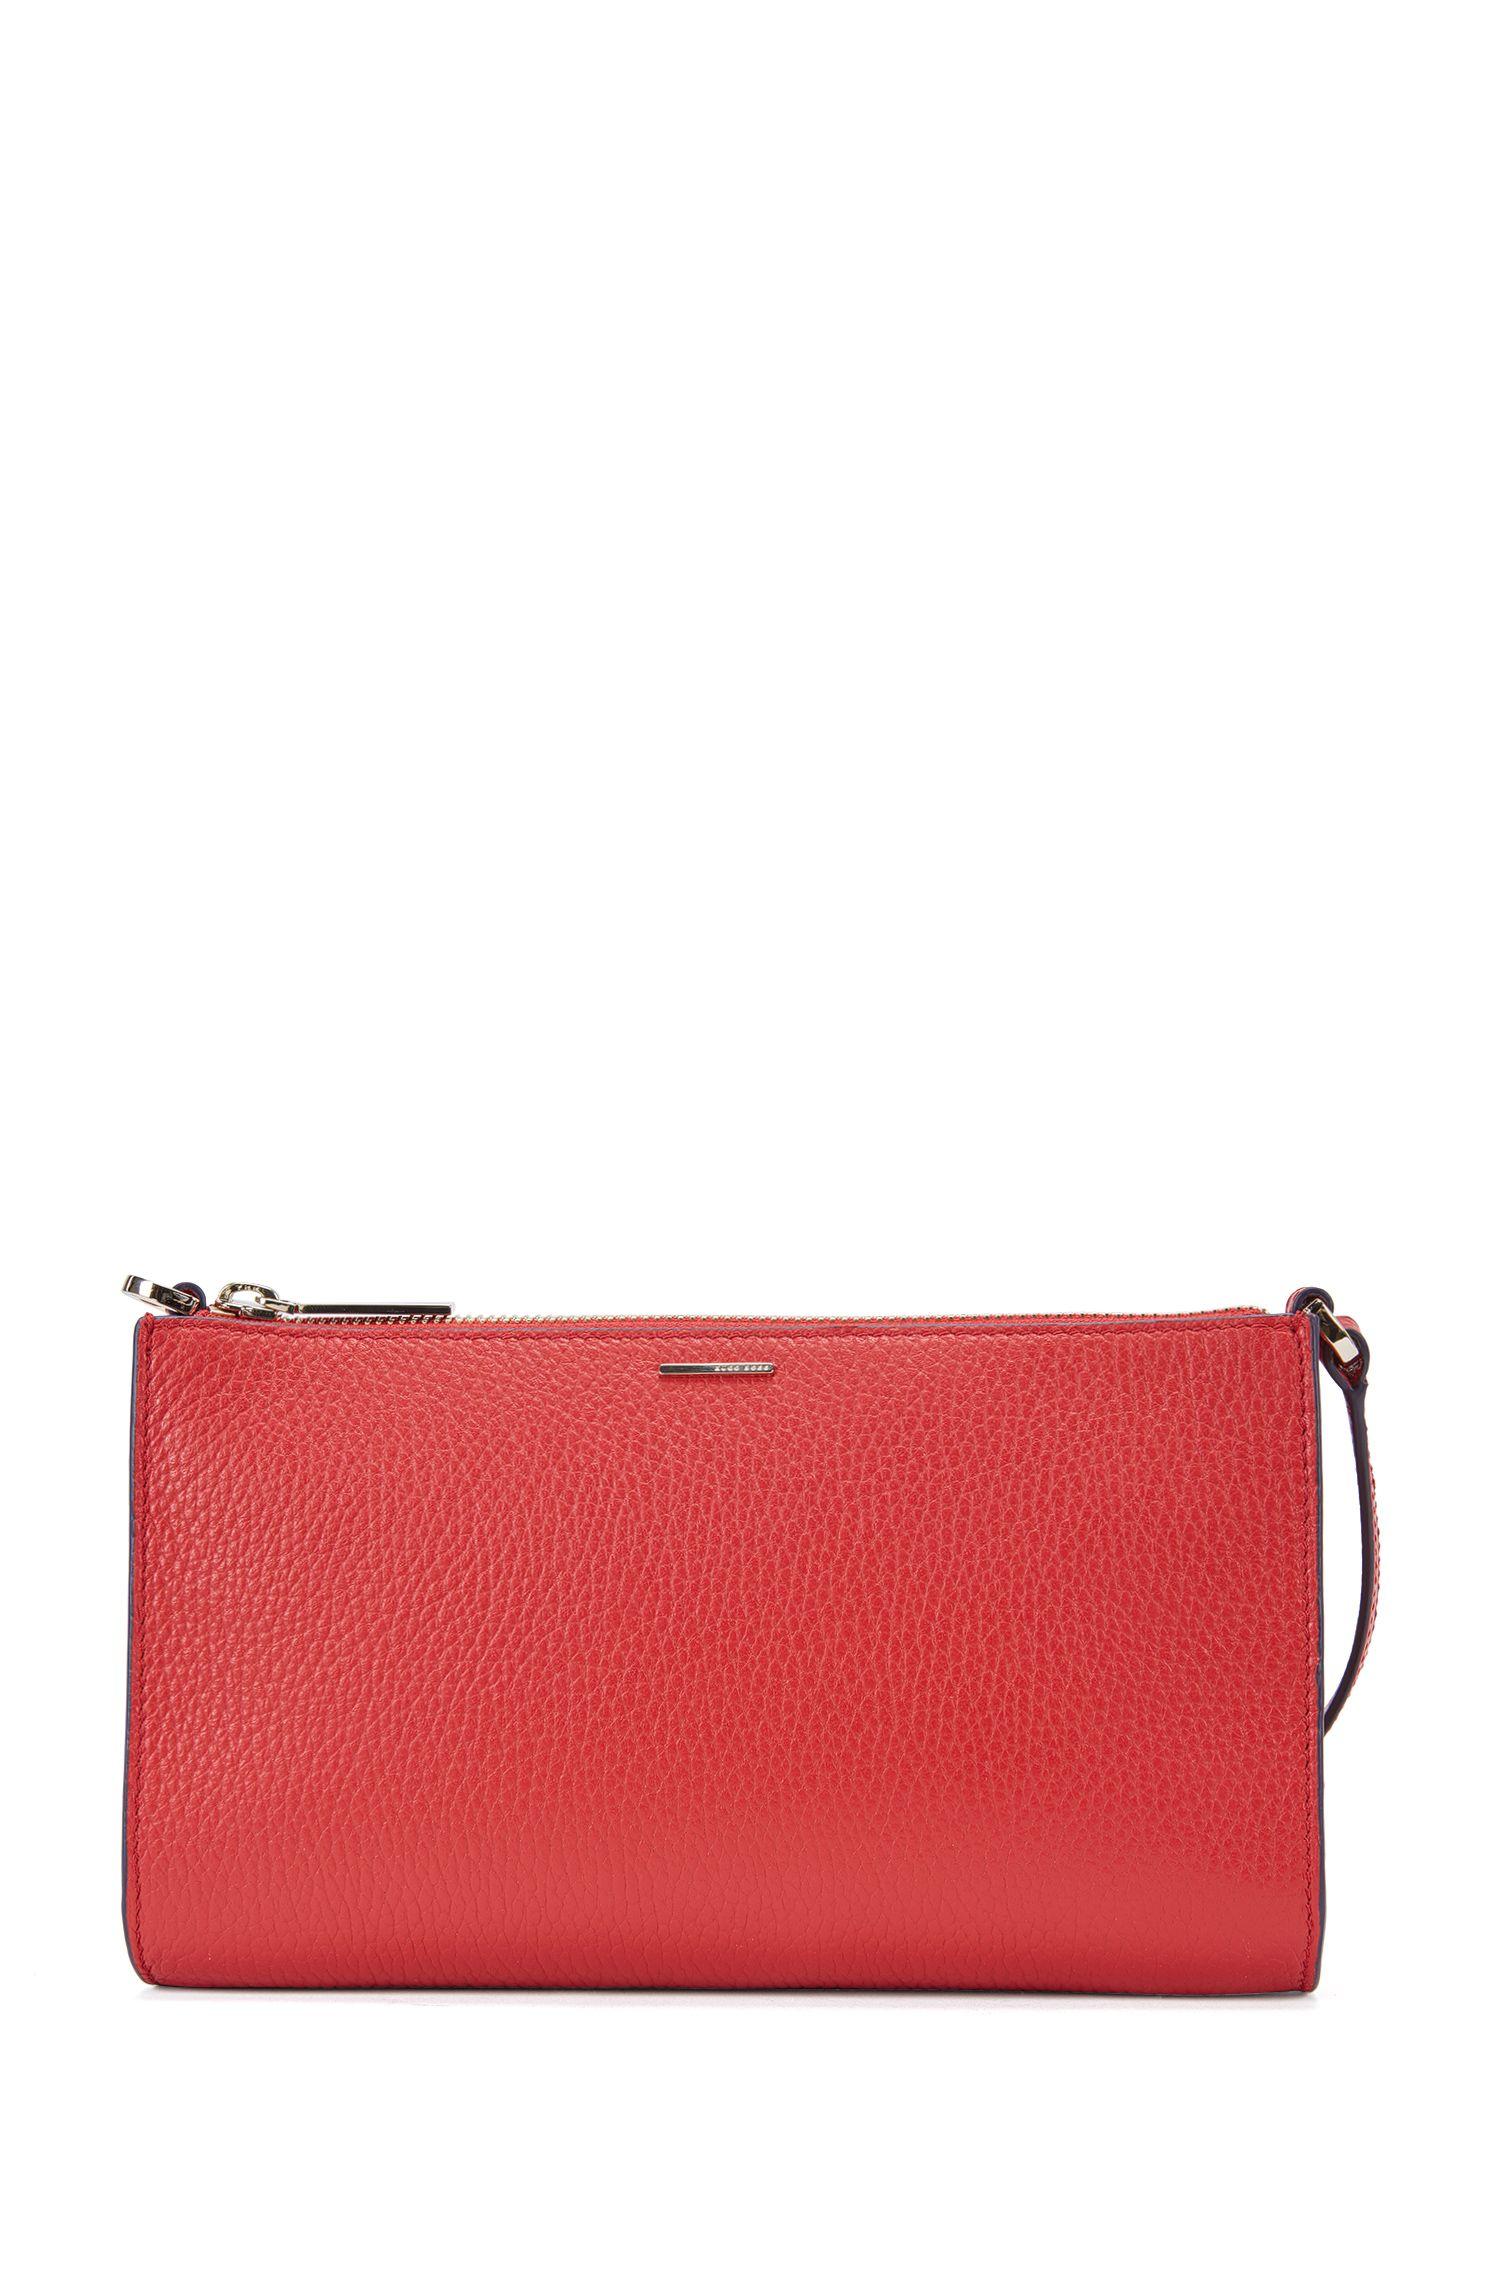 Unifarbene Mini Bag aus strukturiertem Leder: 'Staple Mini Bag-A'